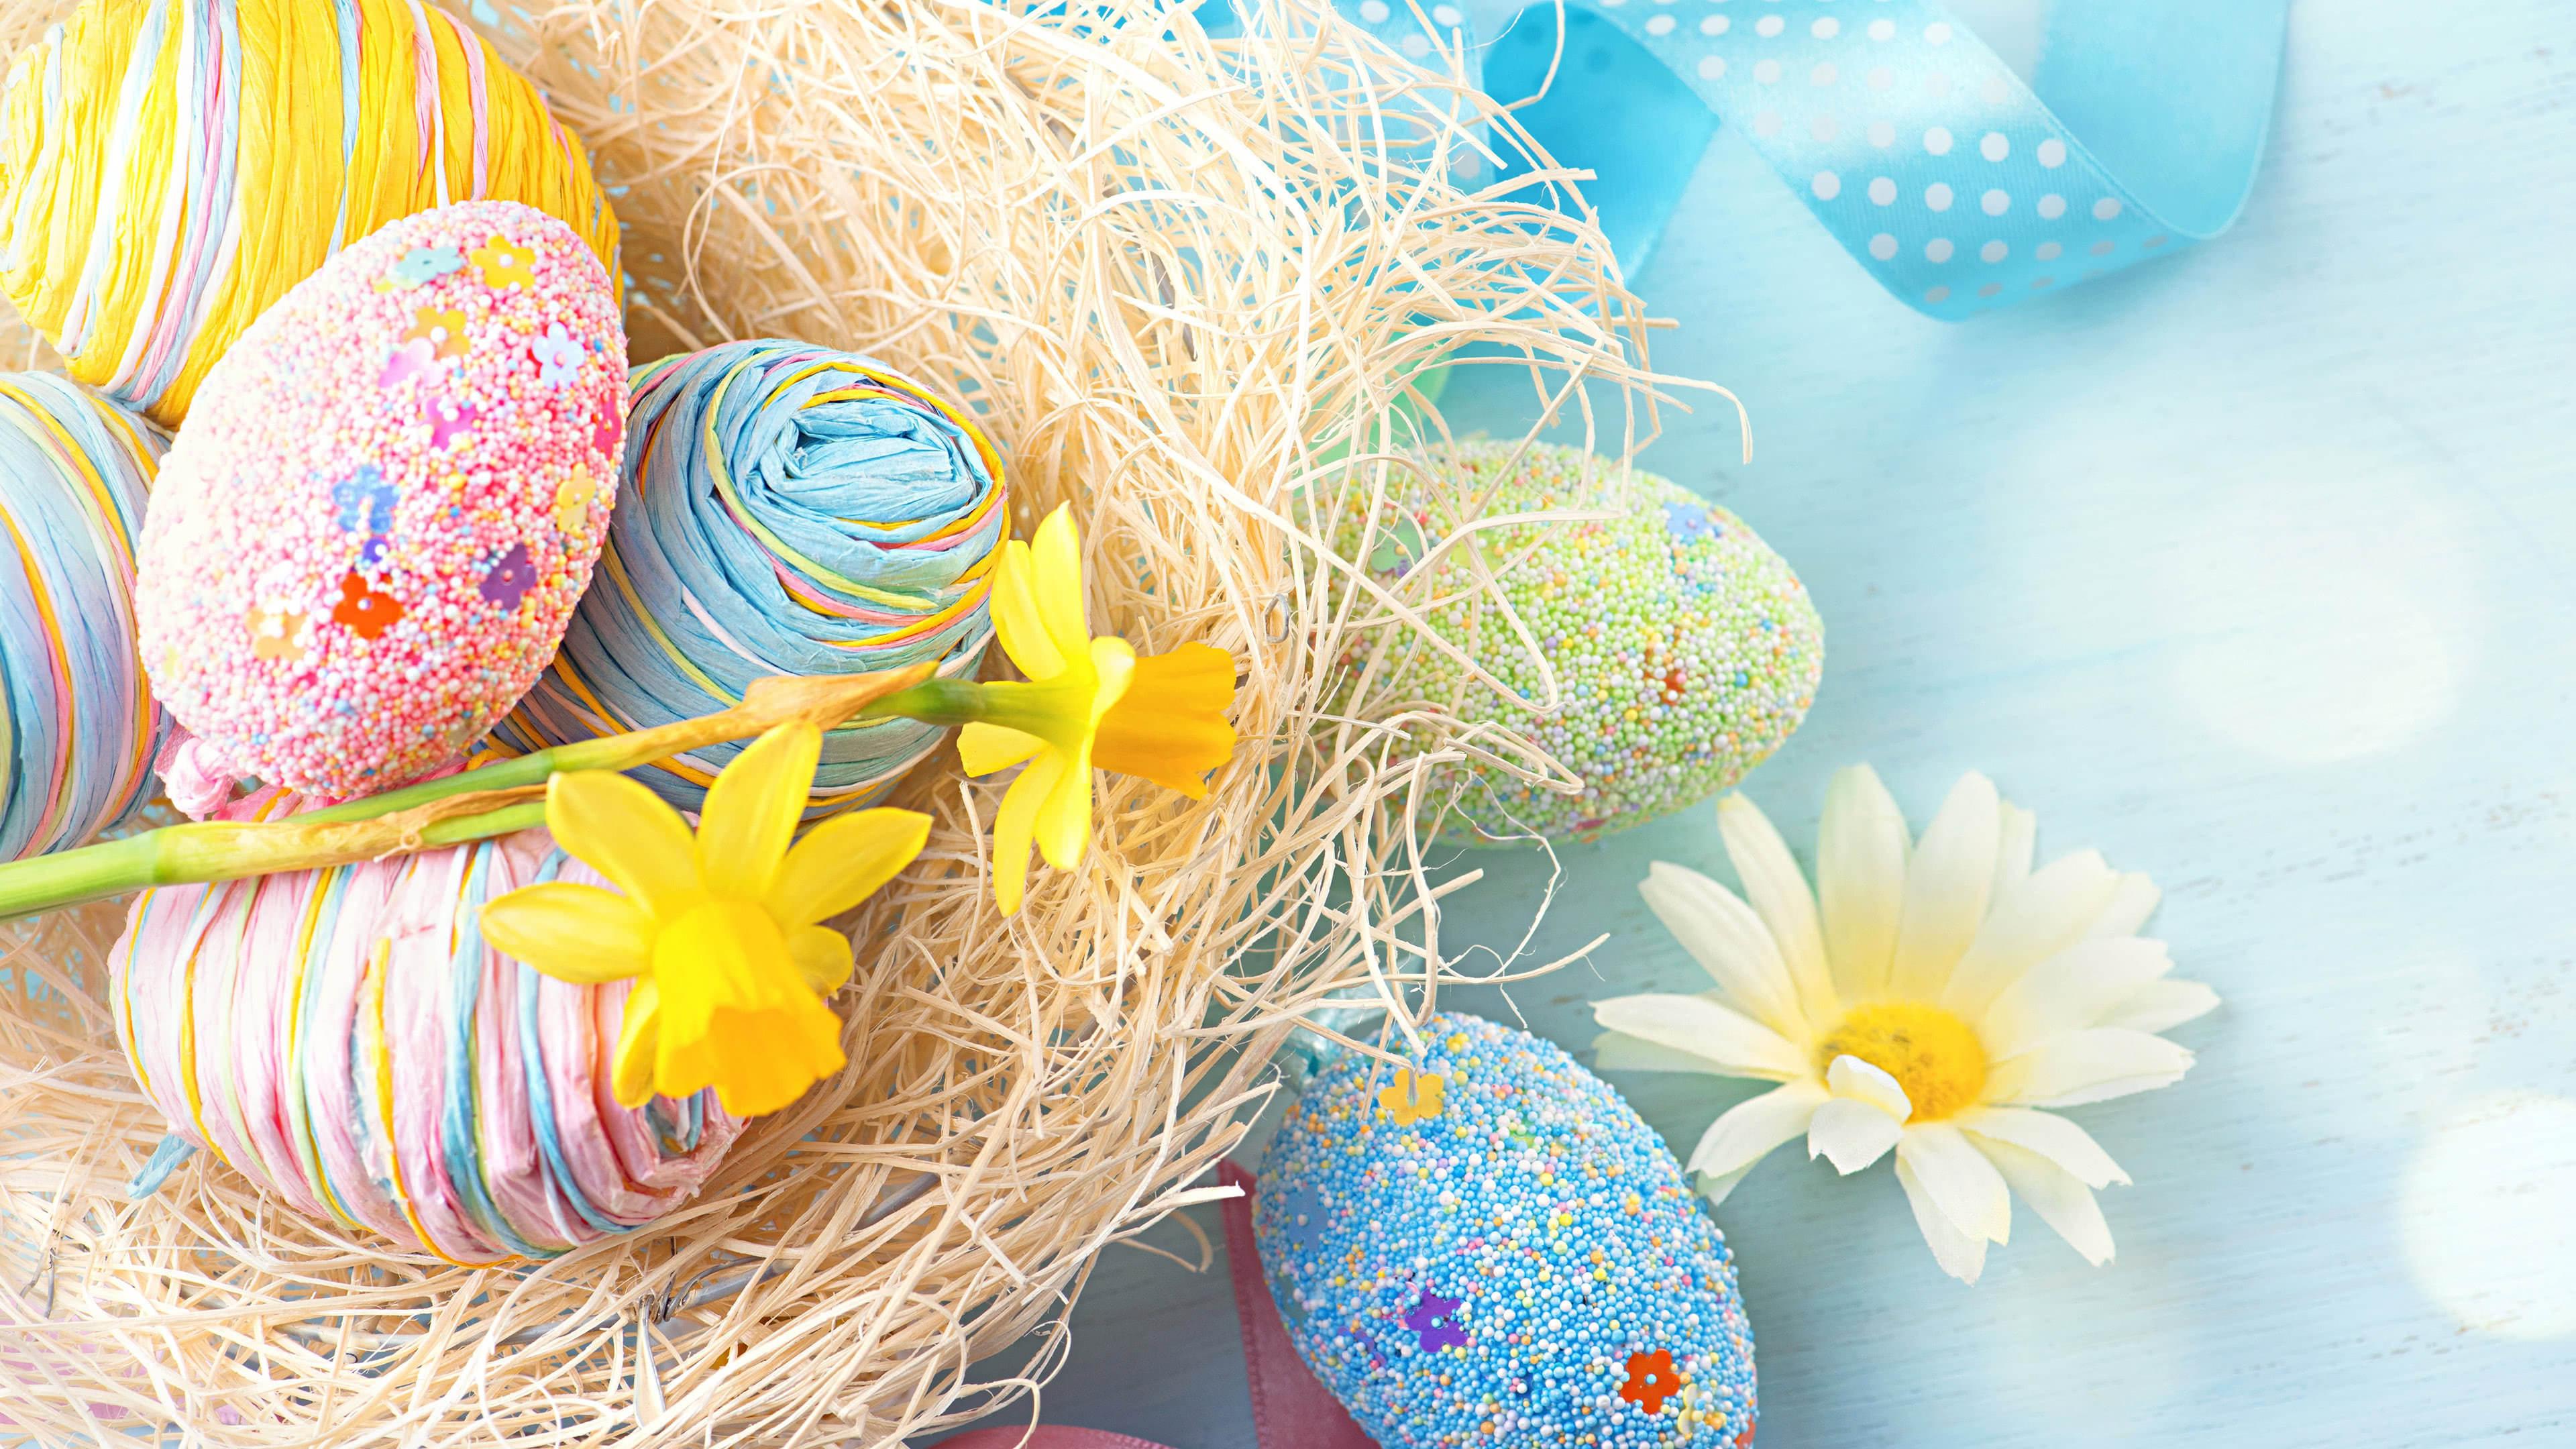 Easter Eggs And Flowers UHD 4K Wallpaper Pixelz 3840x2160